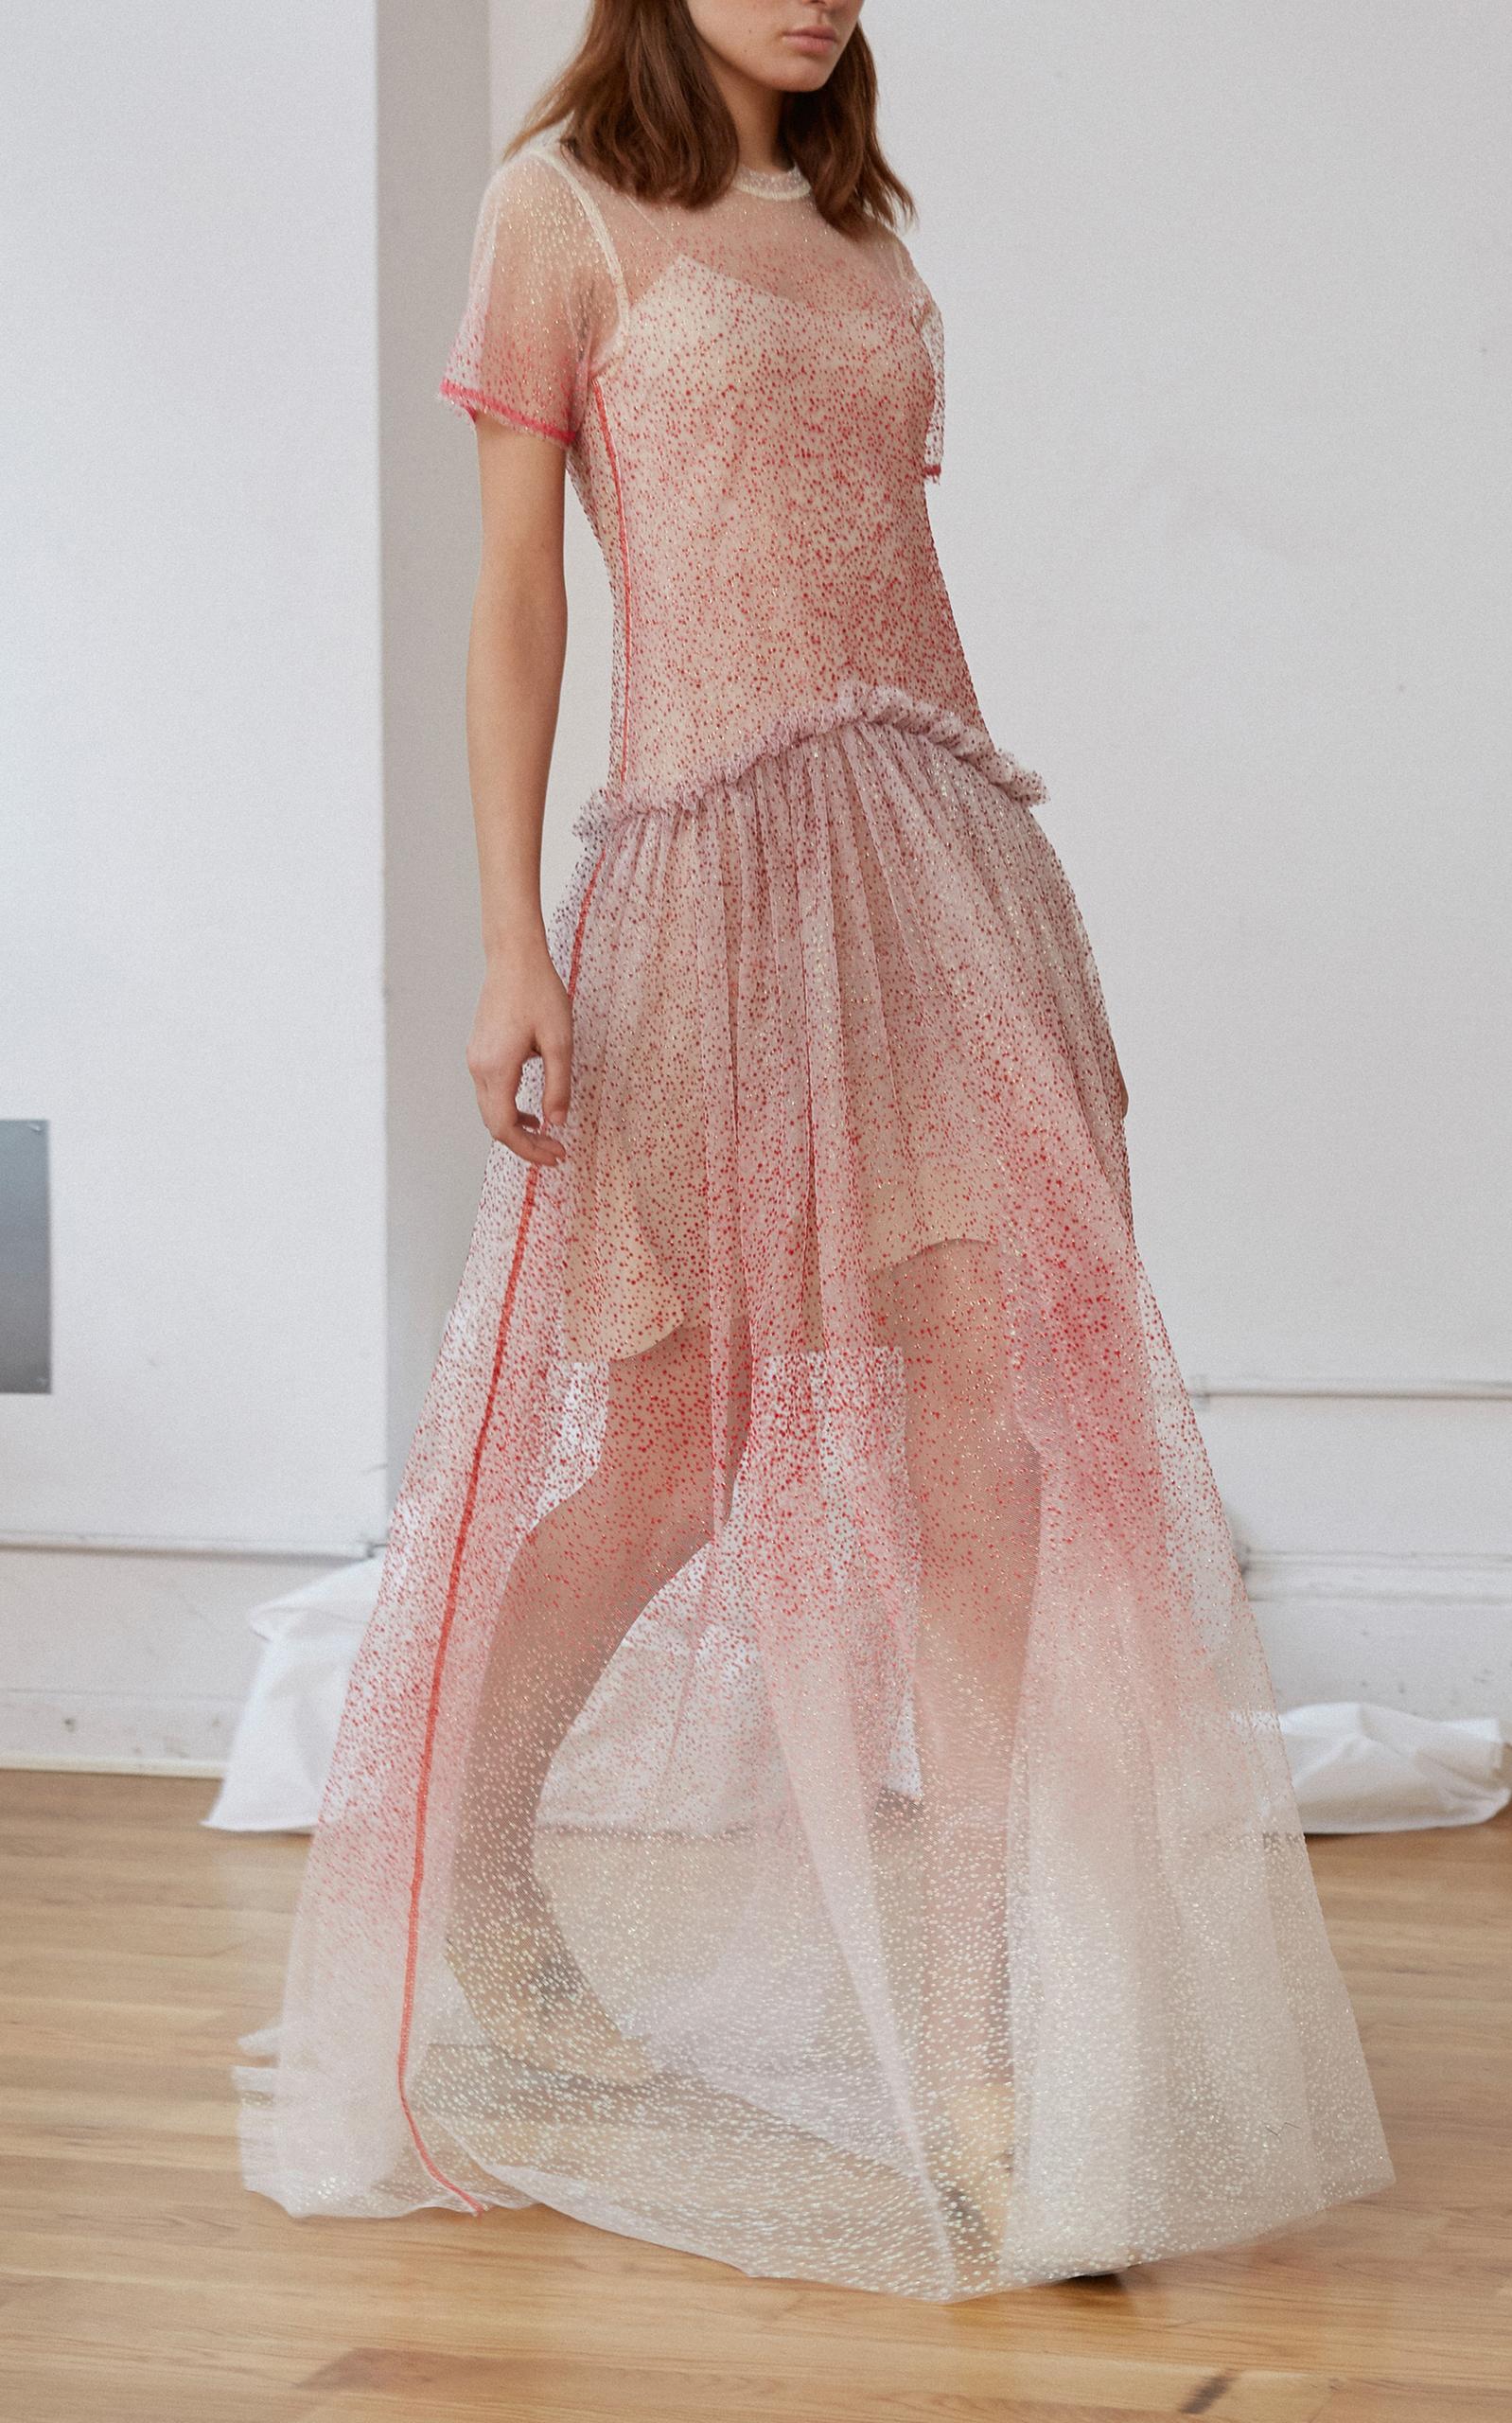 Ebbs And Flows Dress by Rosie Assoulin | Moda Operandi